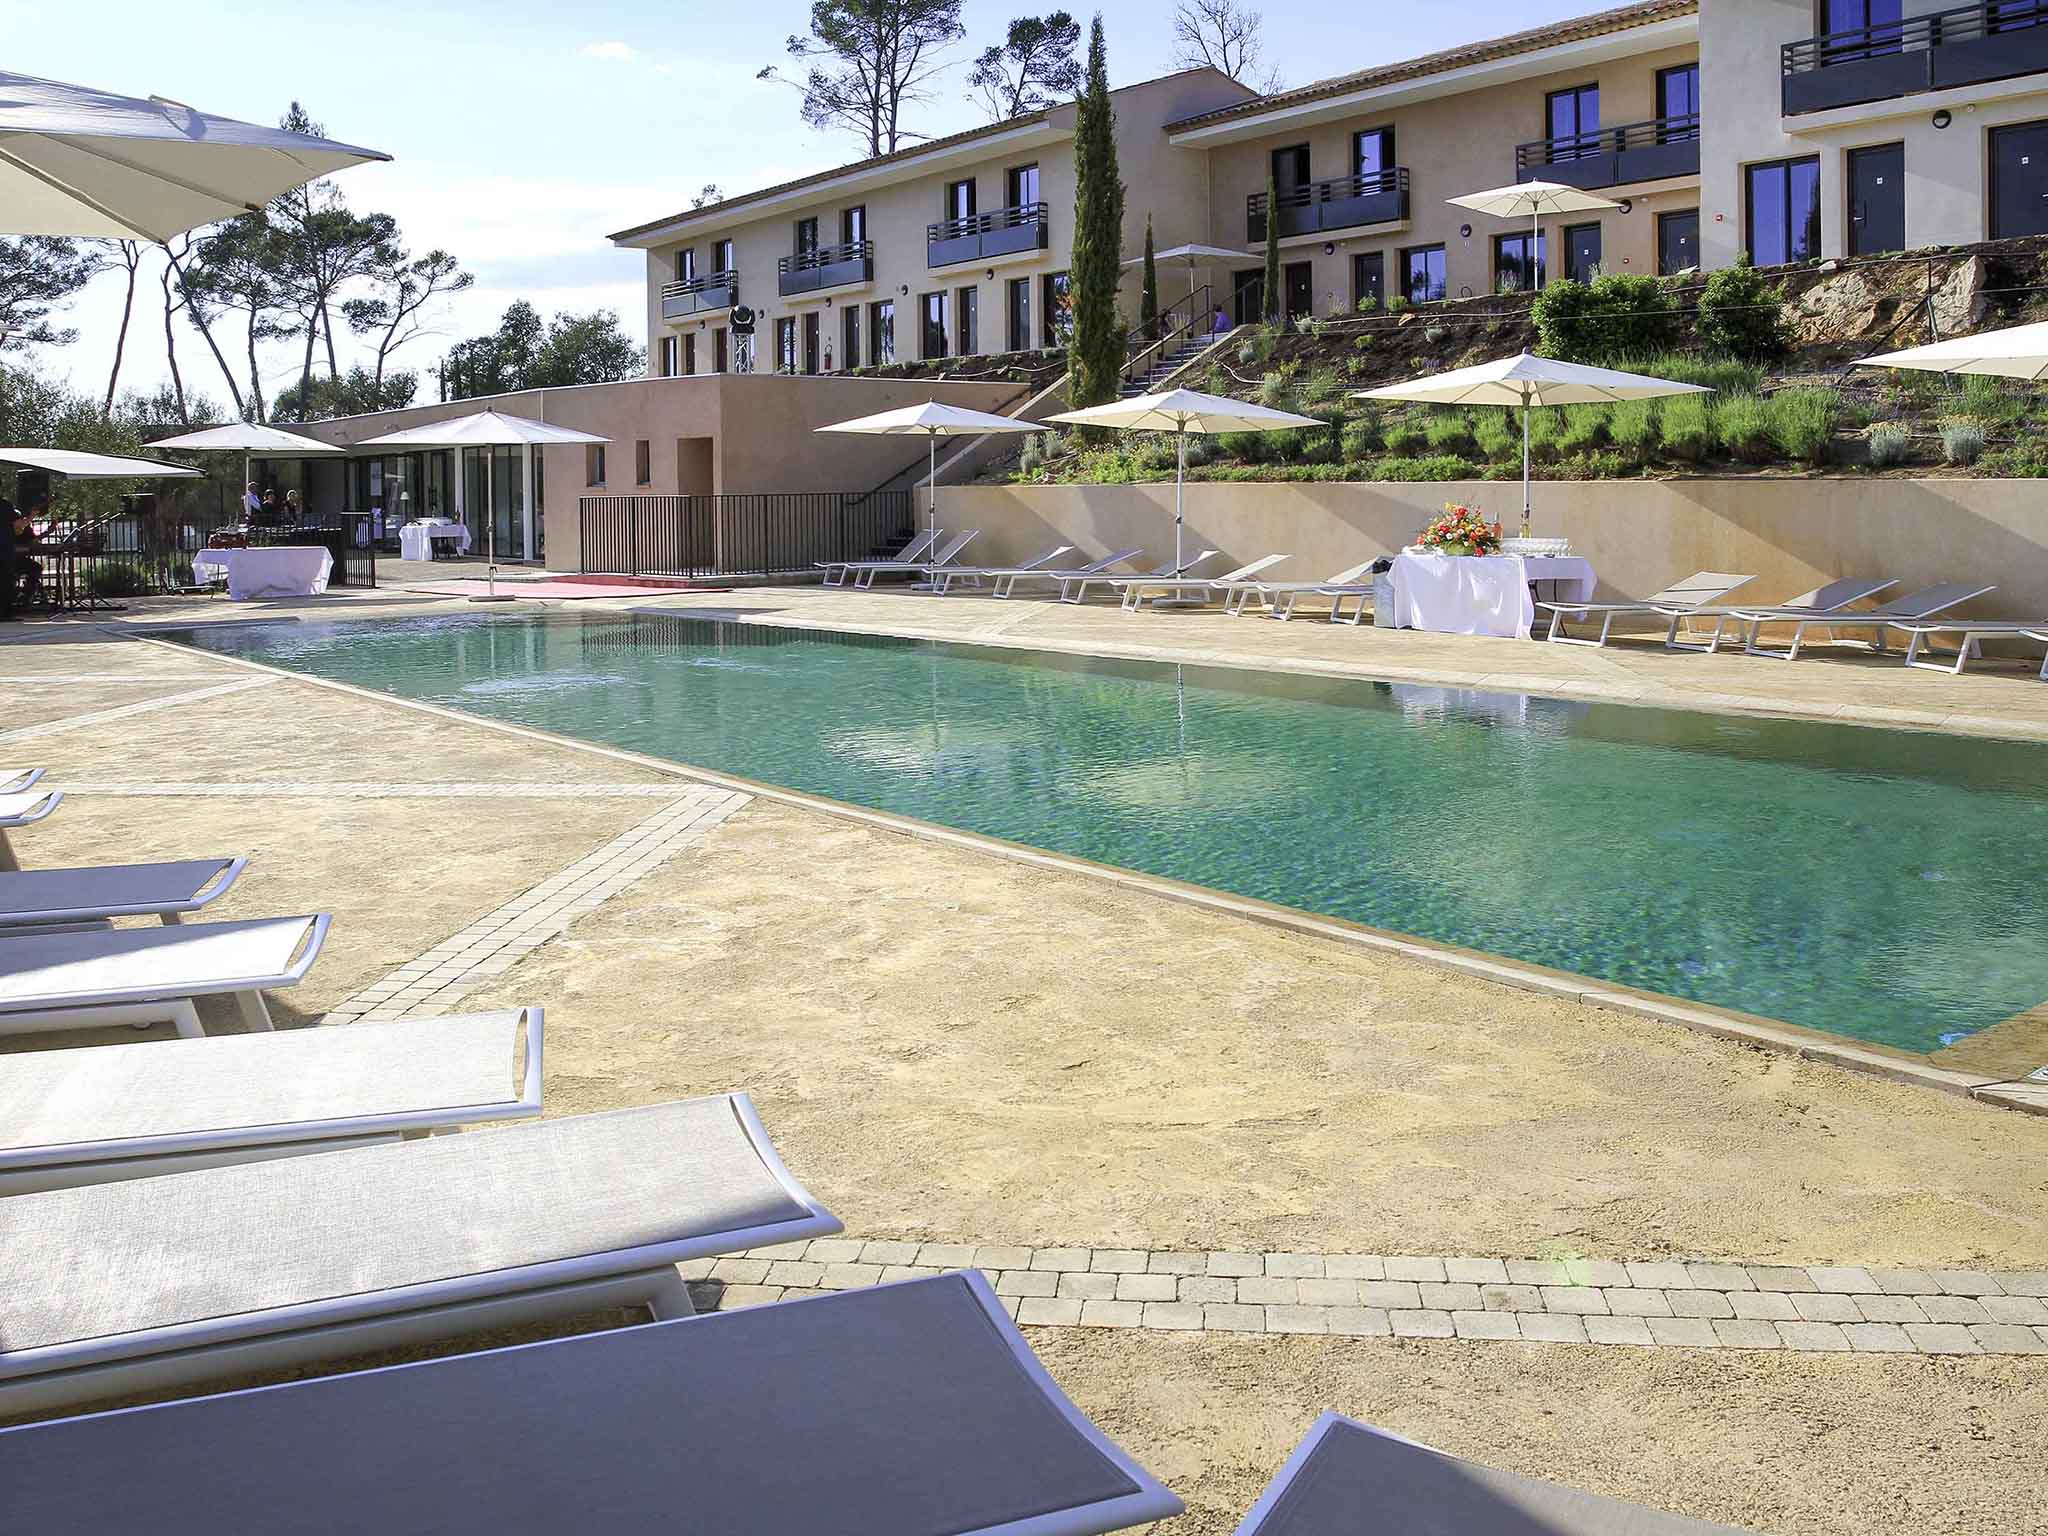 Hotell – Hôtel Mercure Brignoles Golf de Barbaroux